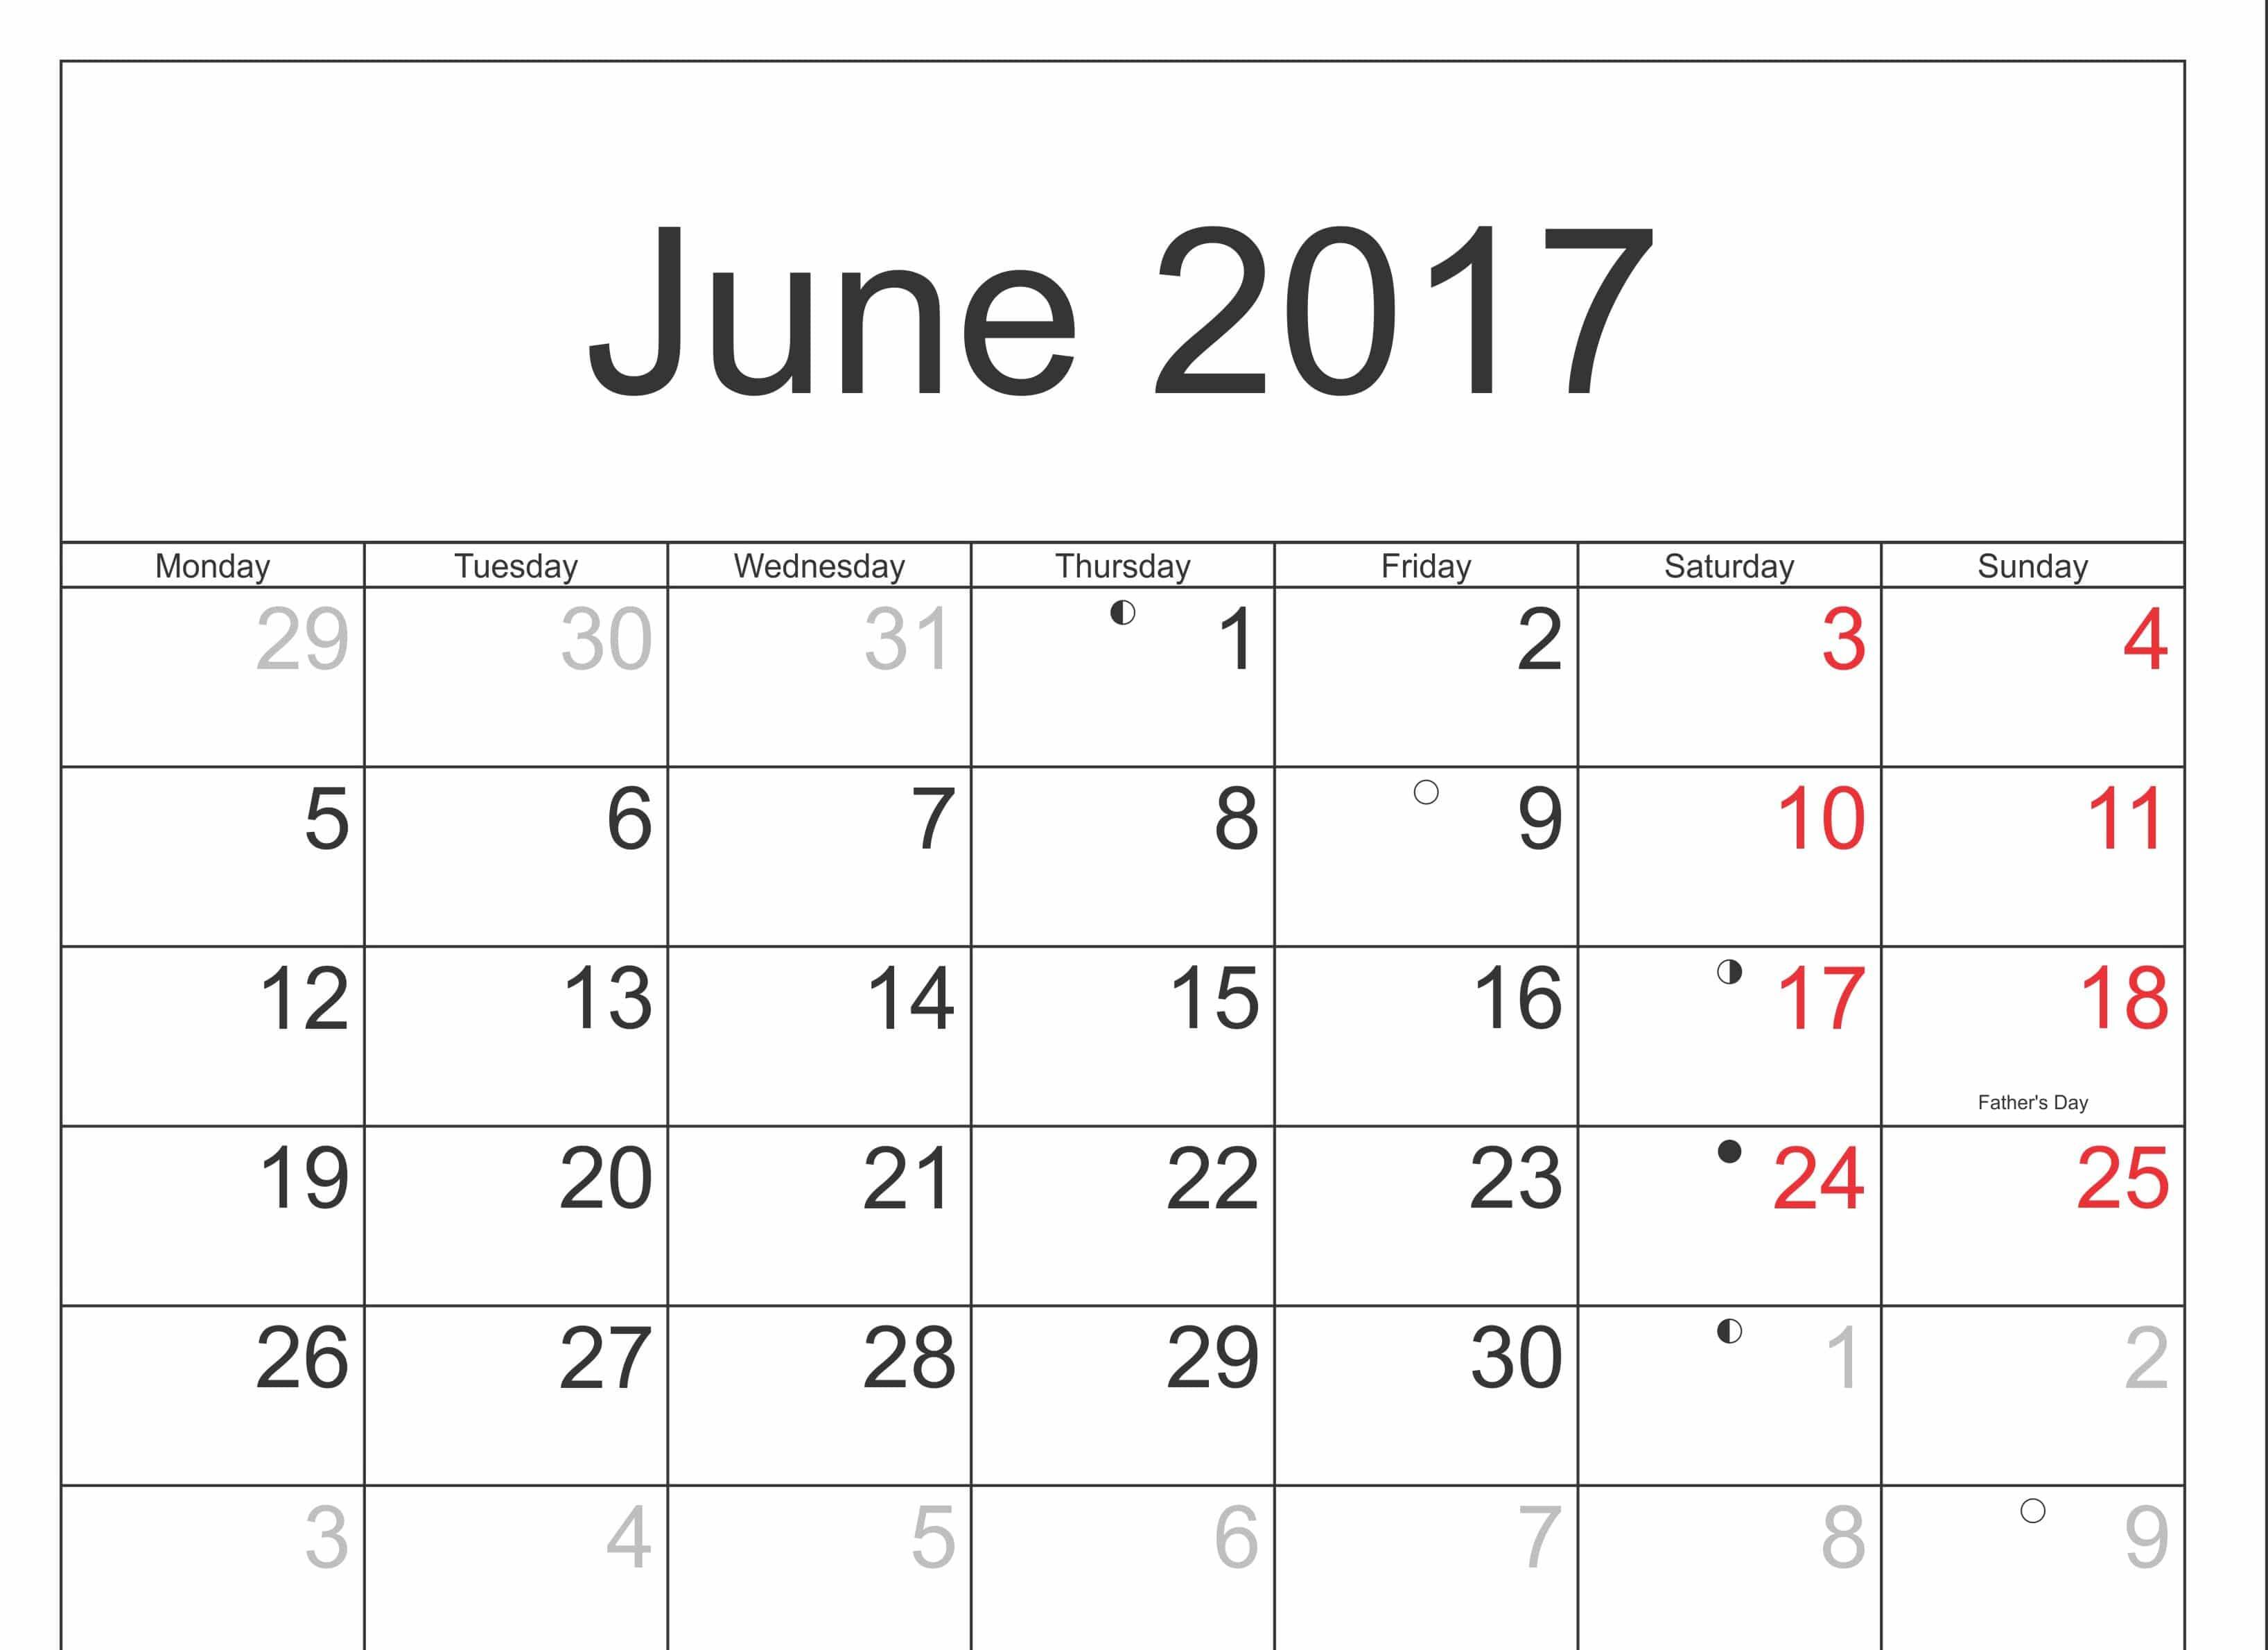 2017 June Calendar With Holidays